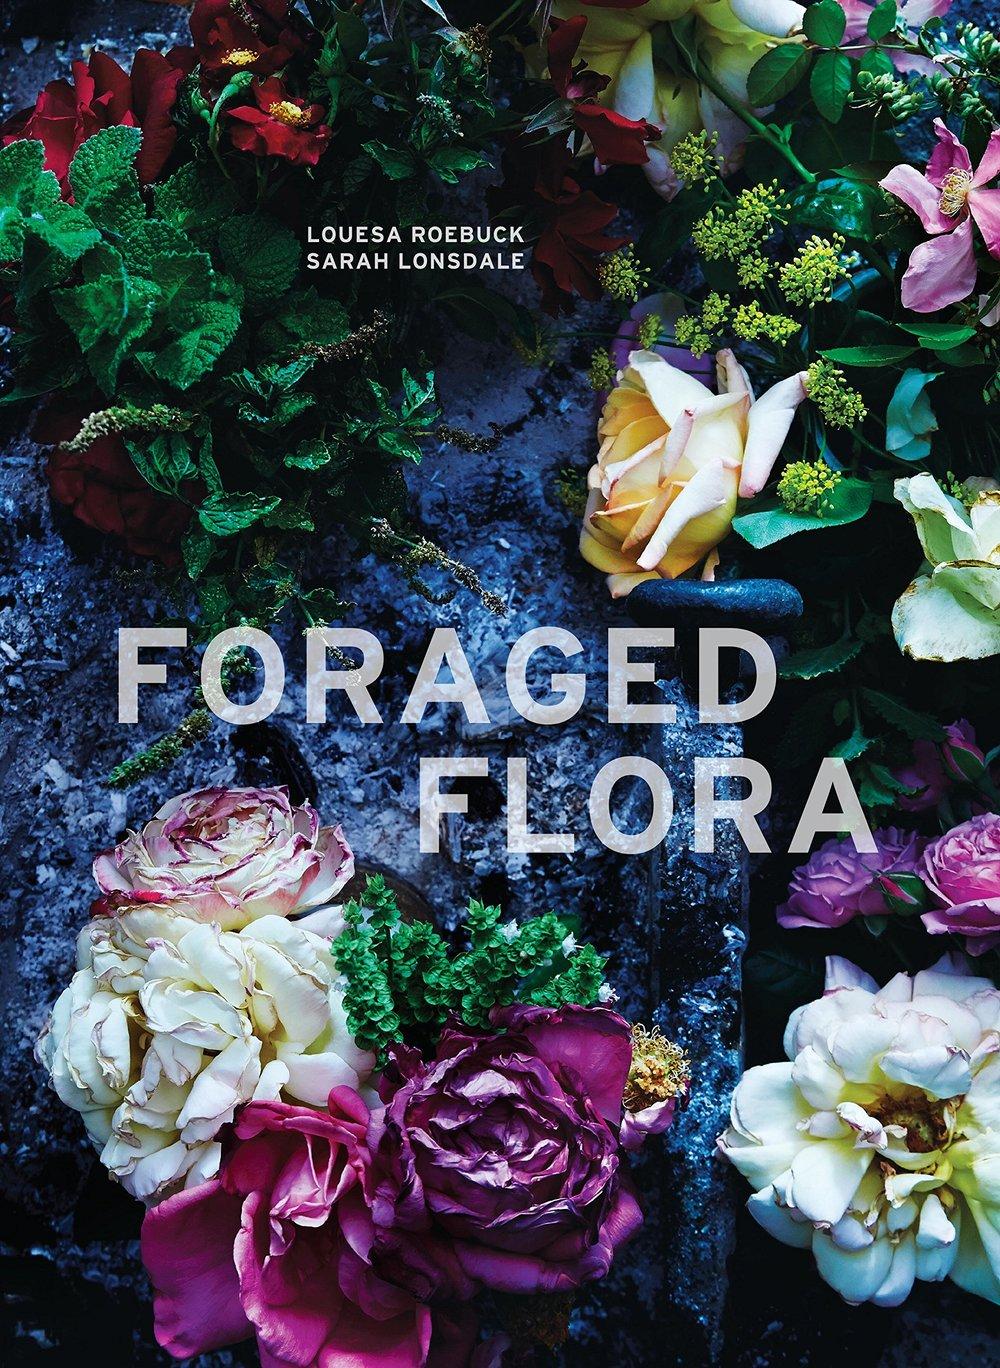 Copy of Foraged Flora